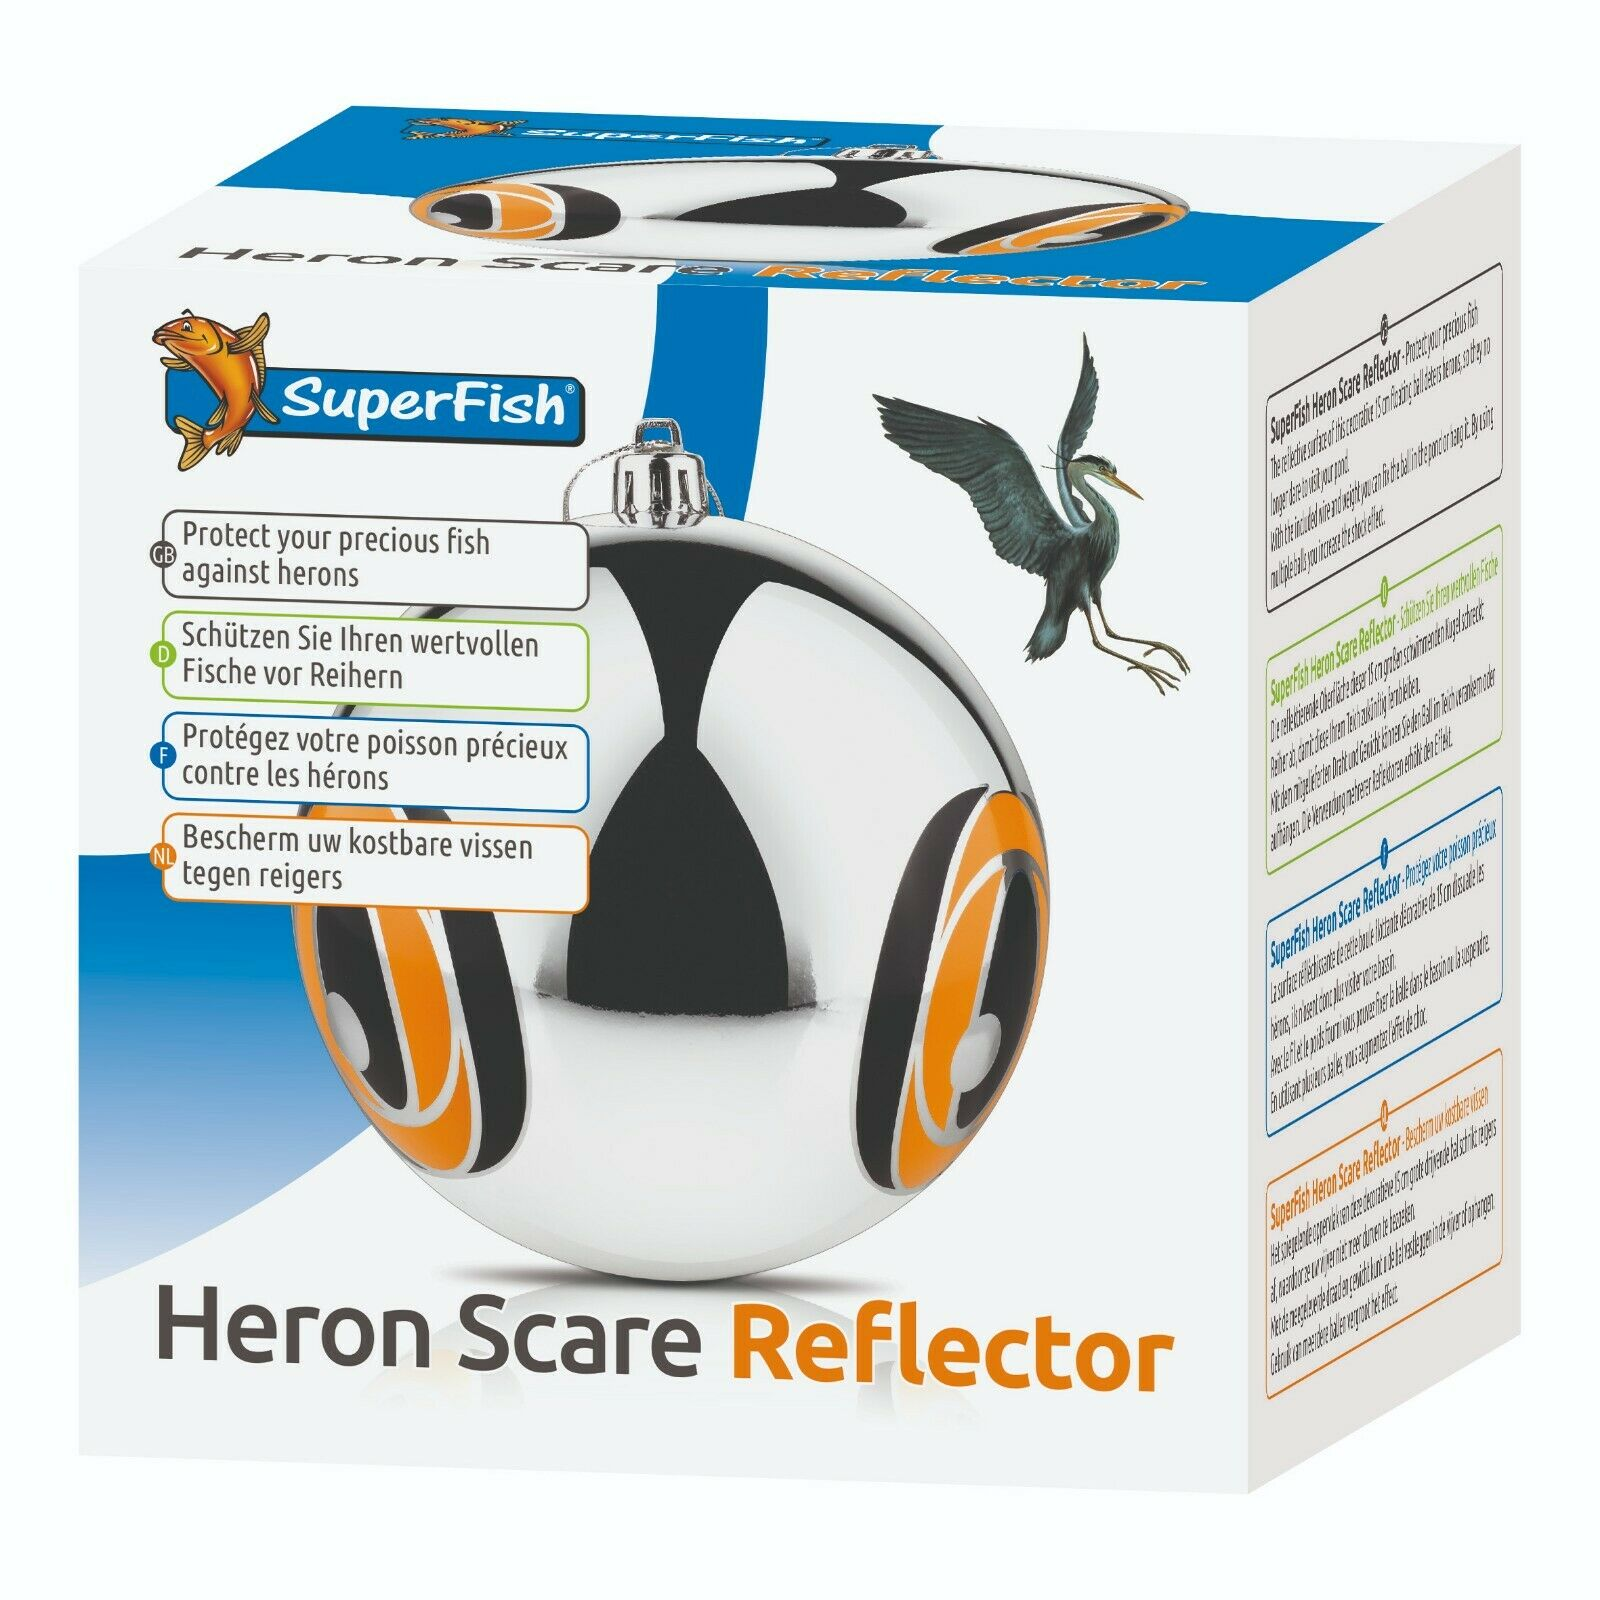 Superfish HERON SCARE REFLECTOR Garden Pond Protector Deterrent Floating Ball